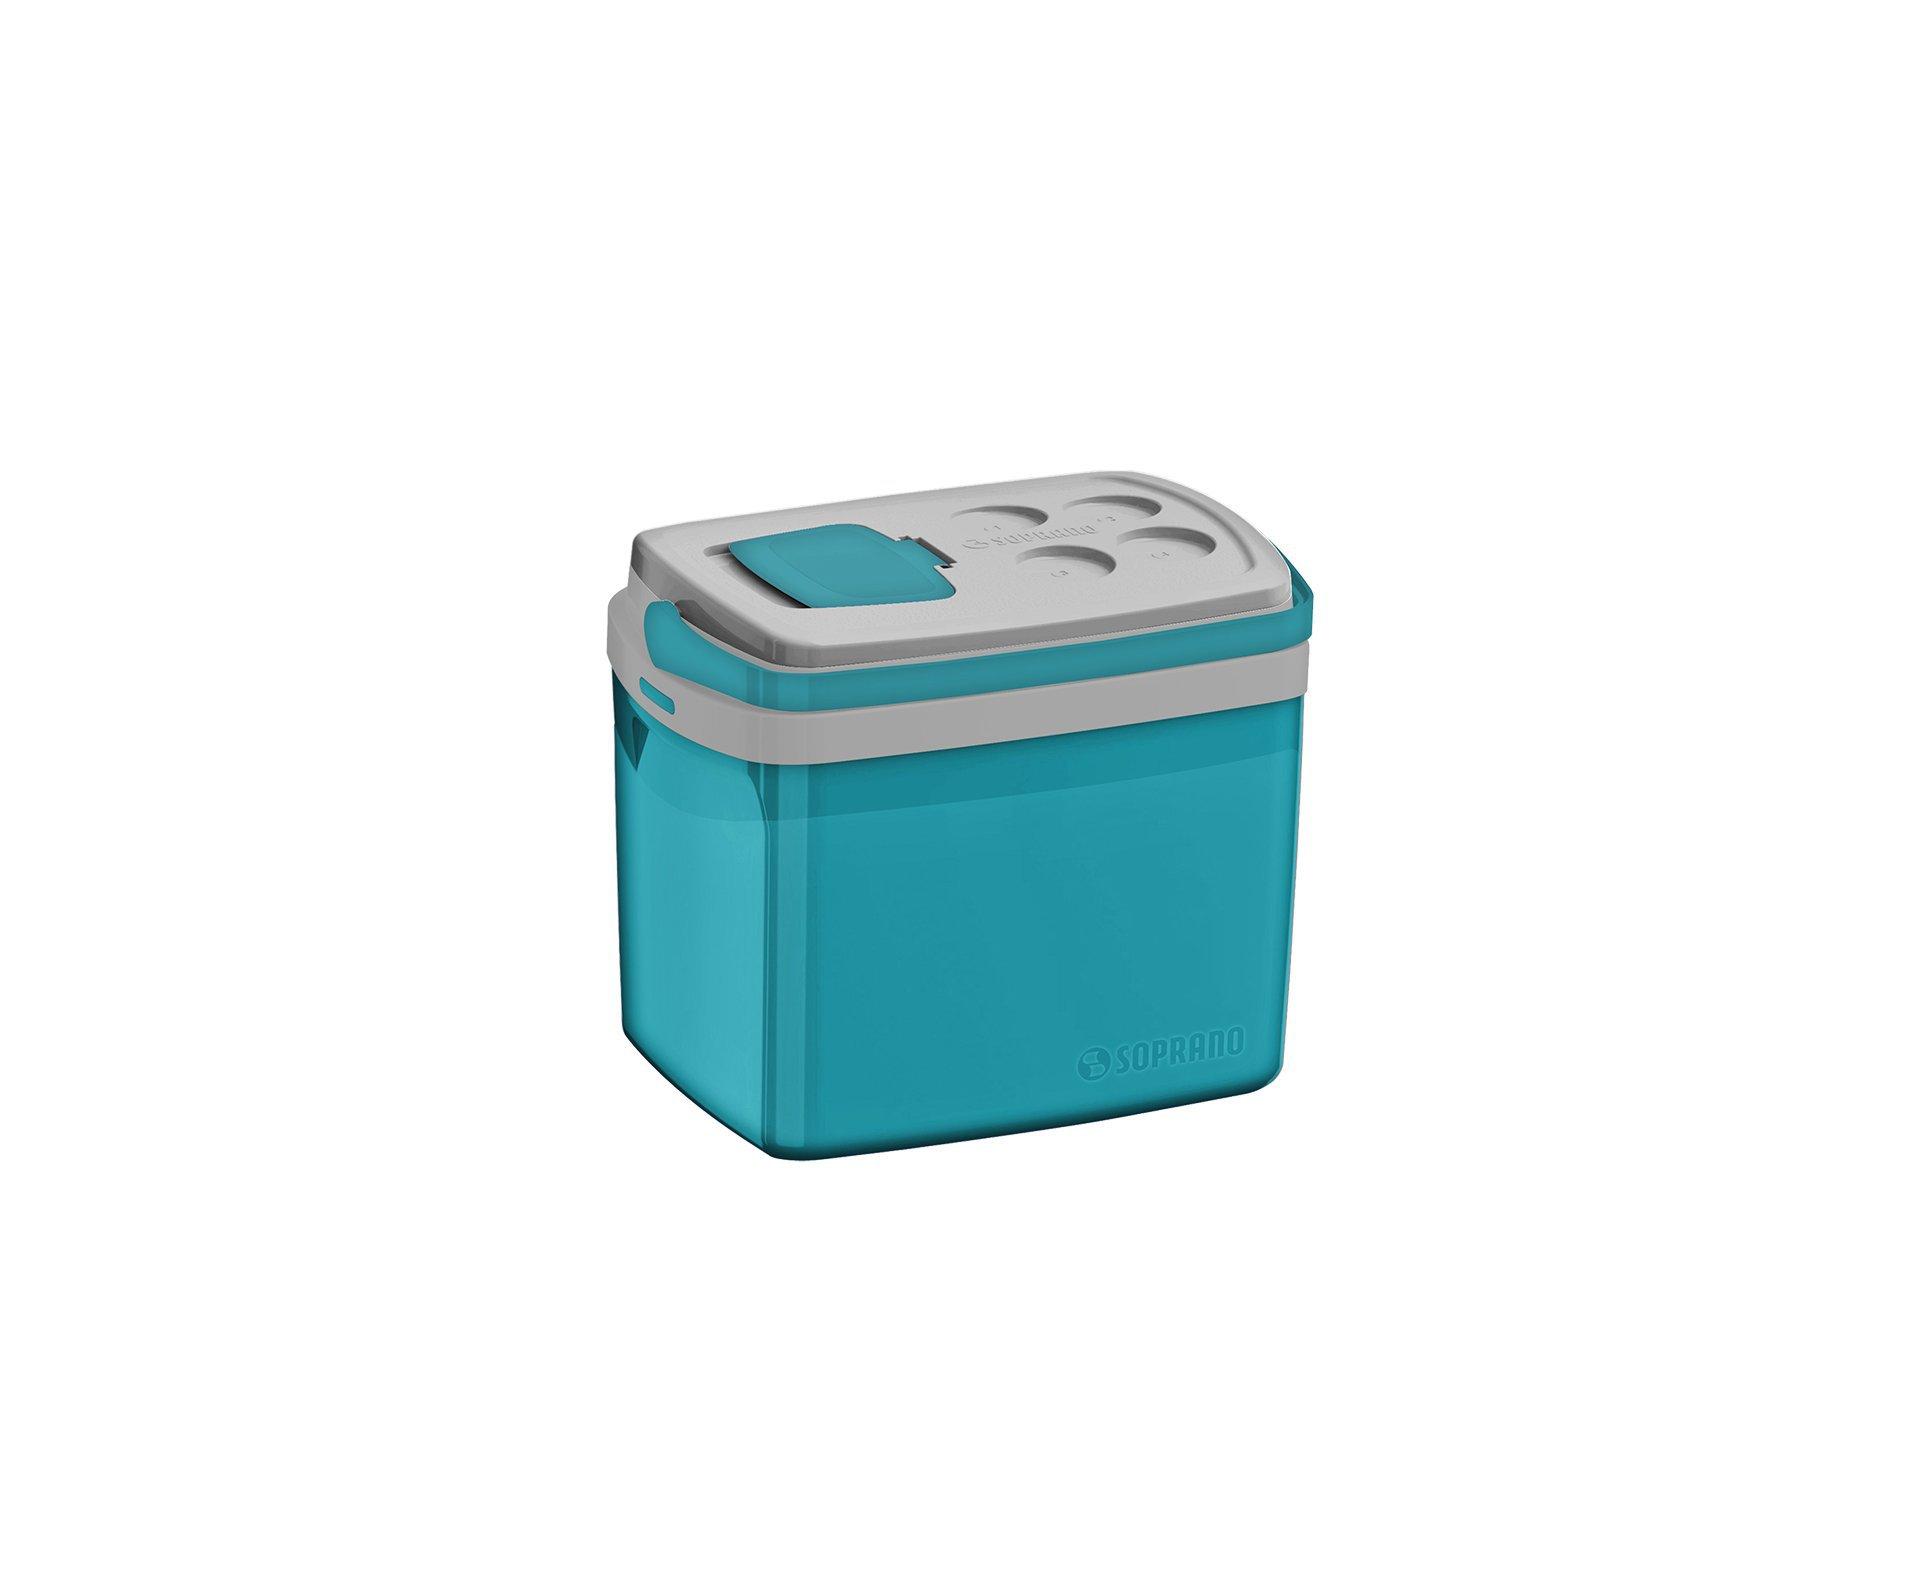 Caixa Termica Tropical 32l Azul - Soprano